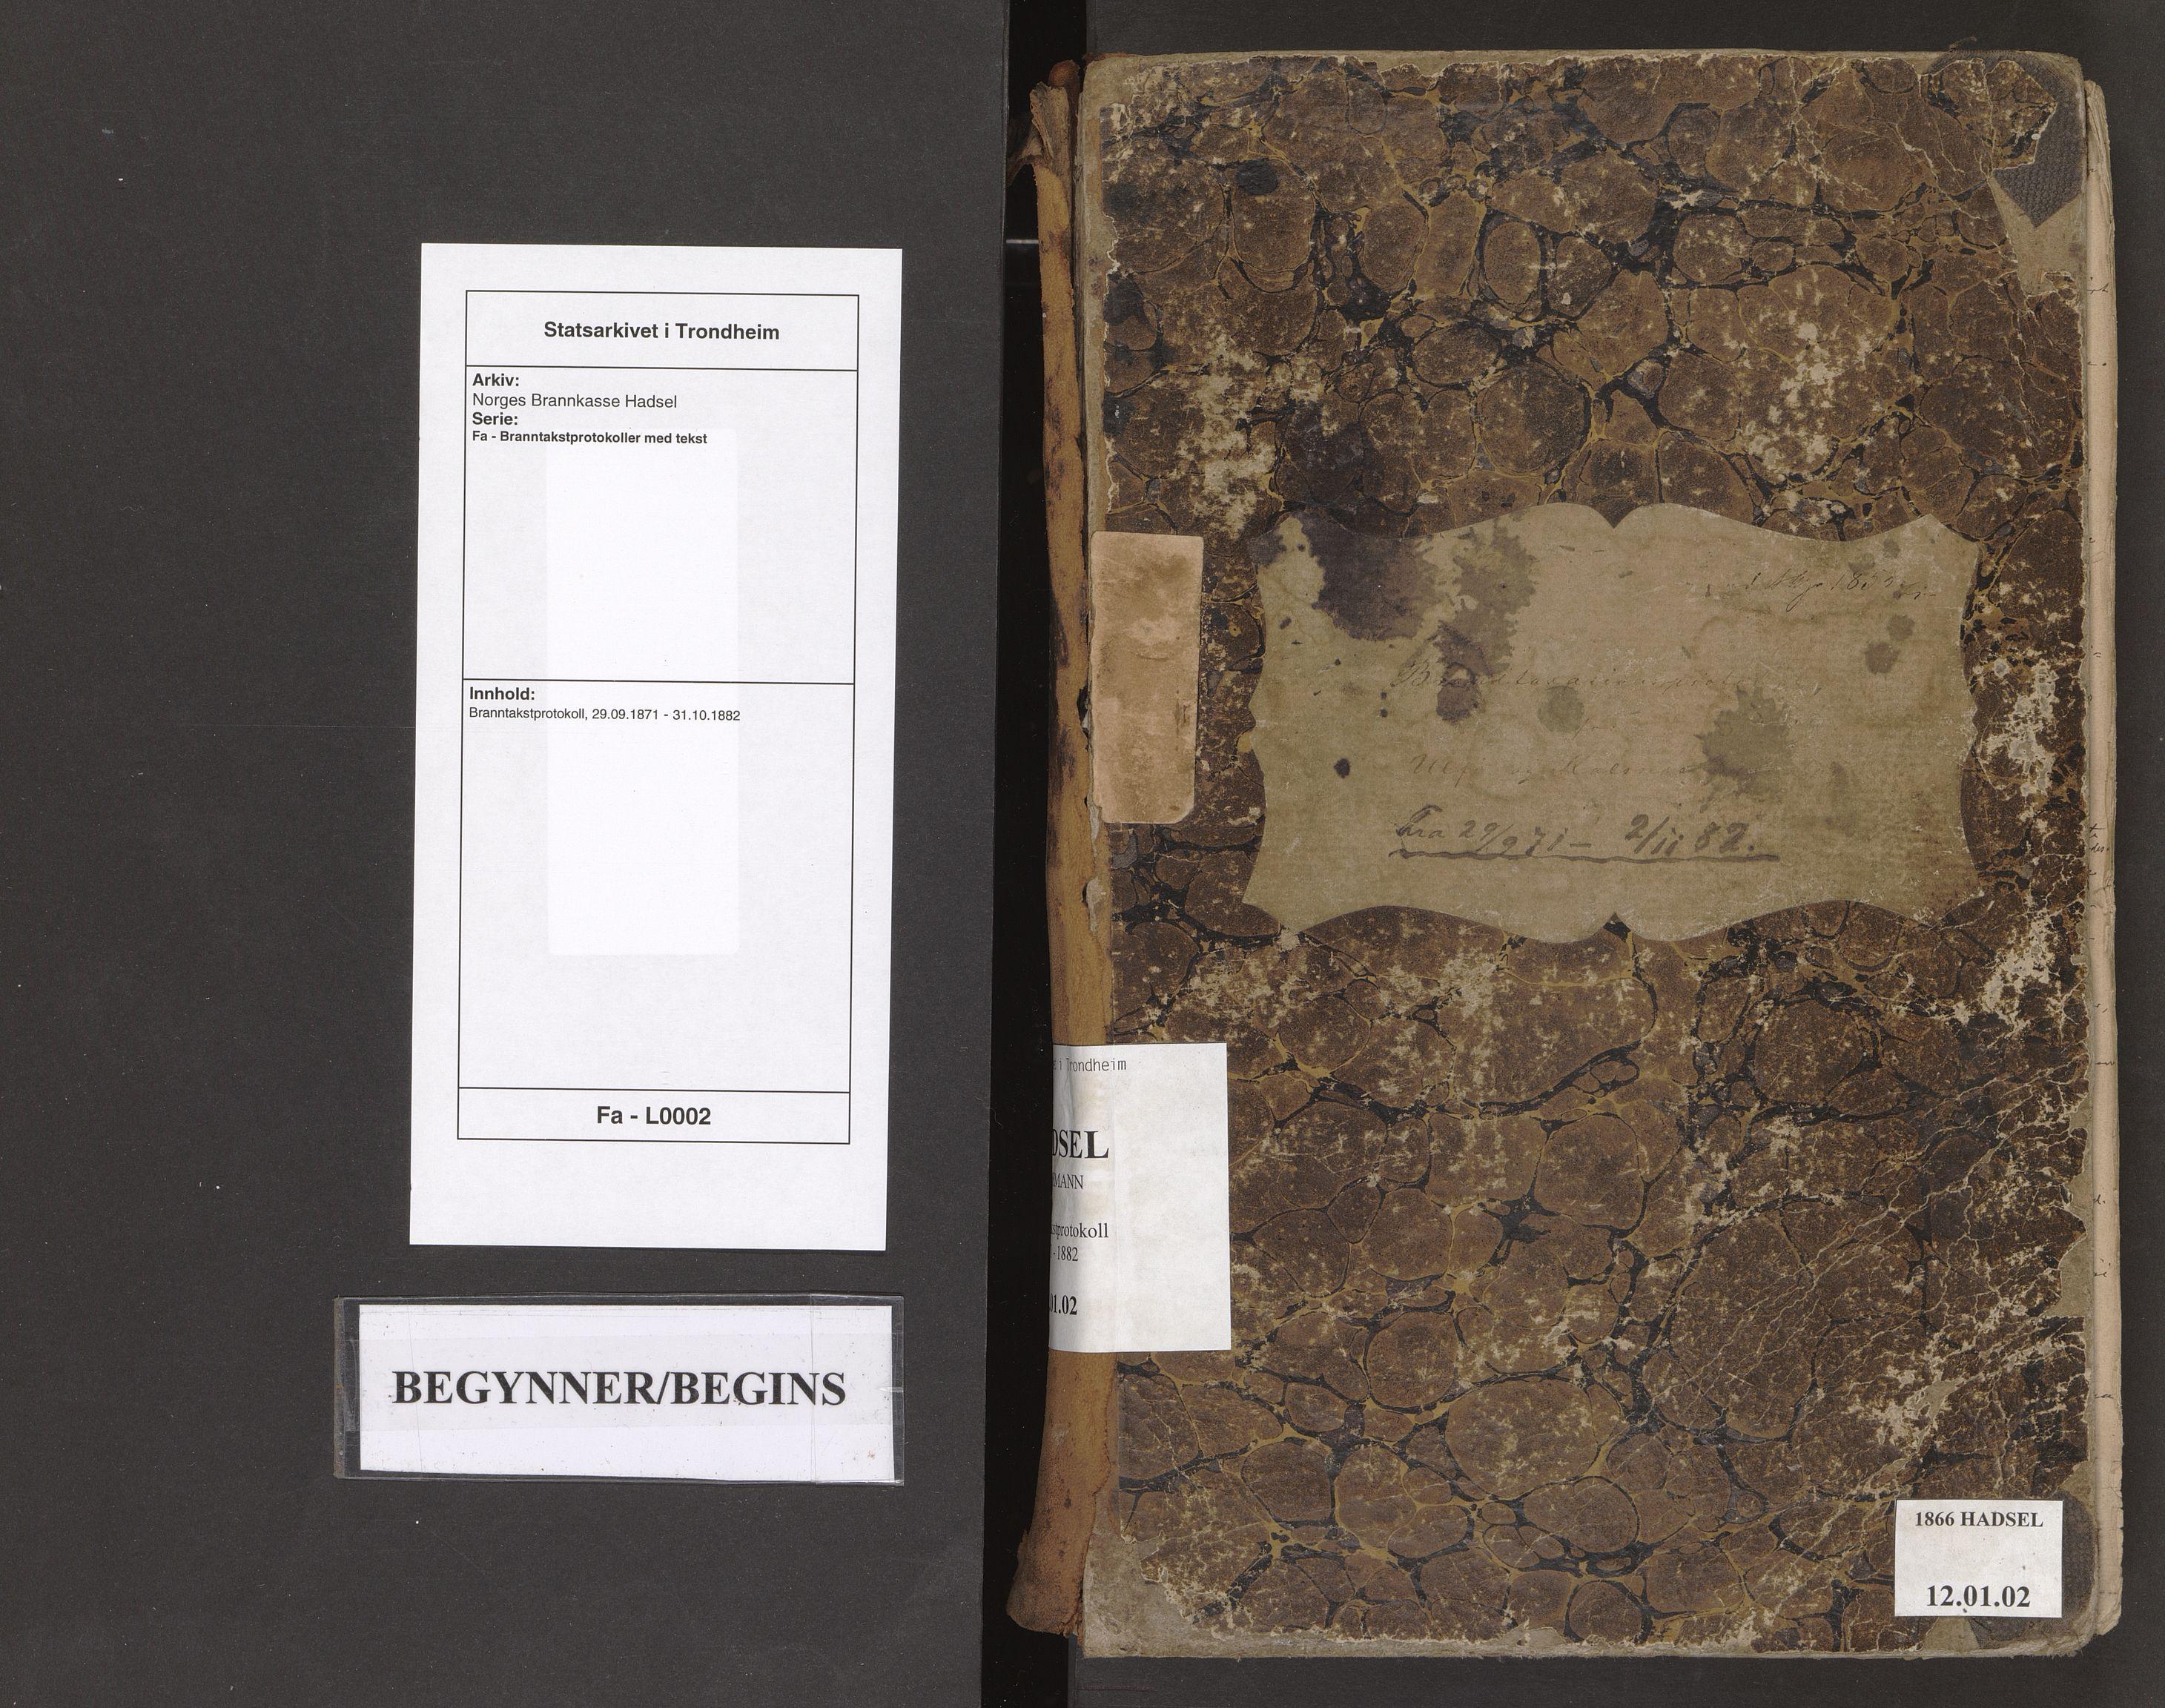 SAT, Norges Brannkasse Hadsel, Fa/L0002: Branntakstprotokoll, 1871-1882